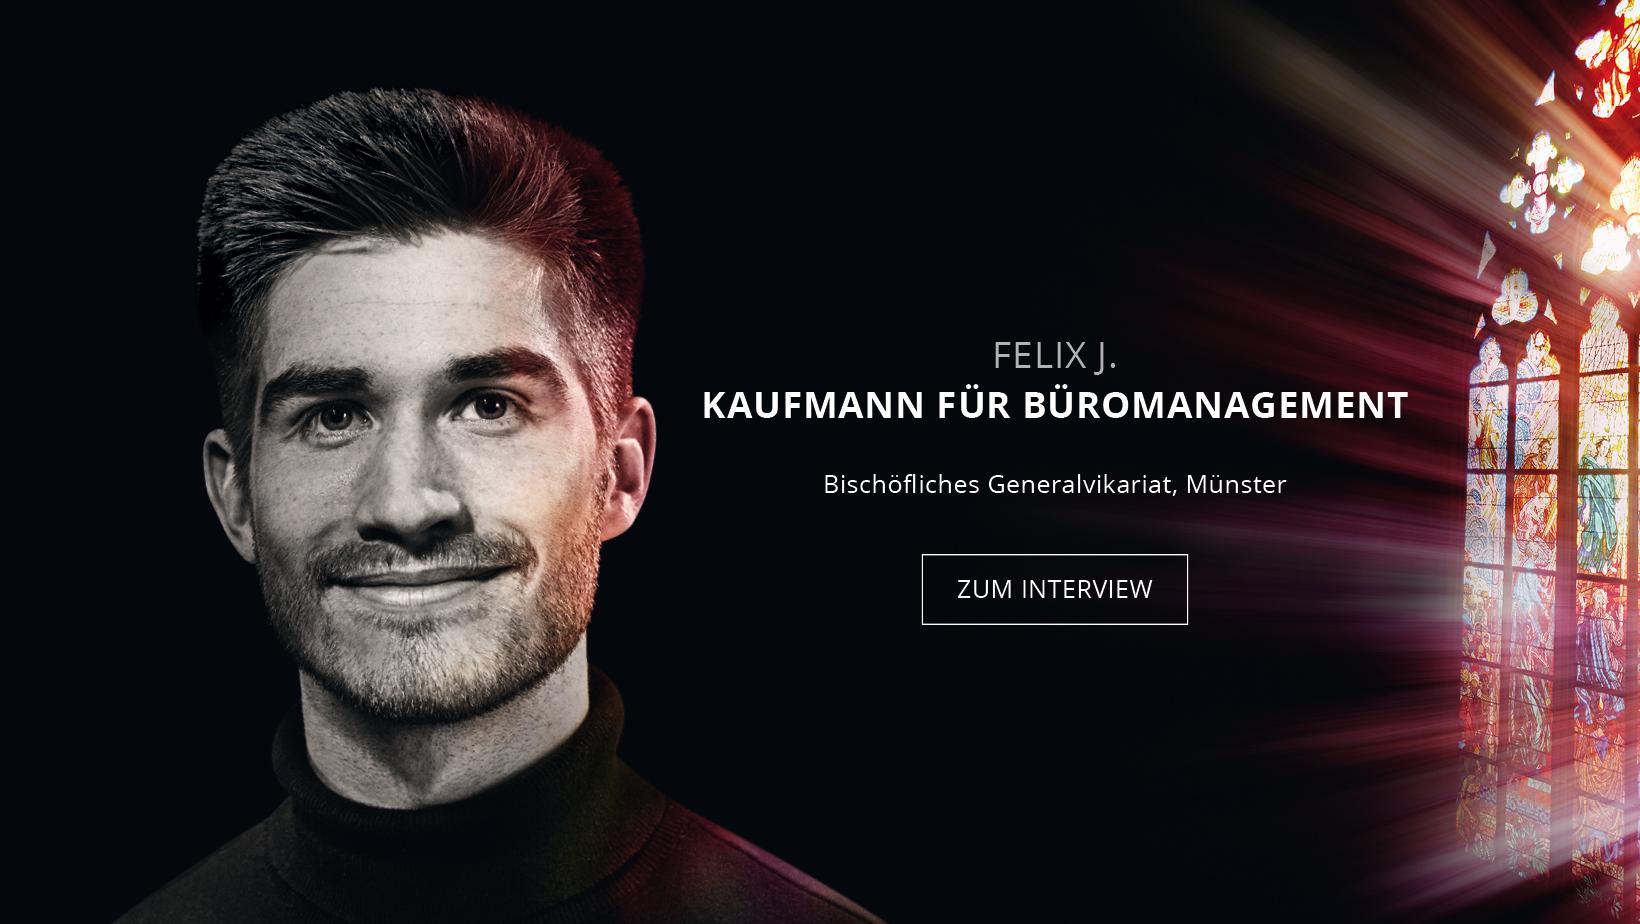 Kaufmann für Bürokommunikation Felix Jacobs